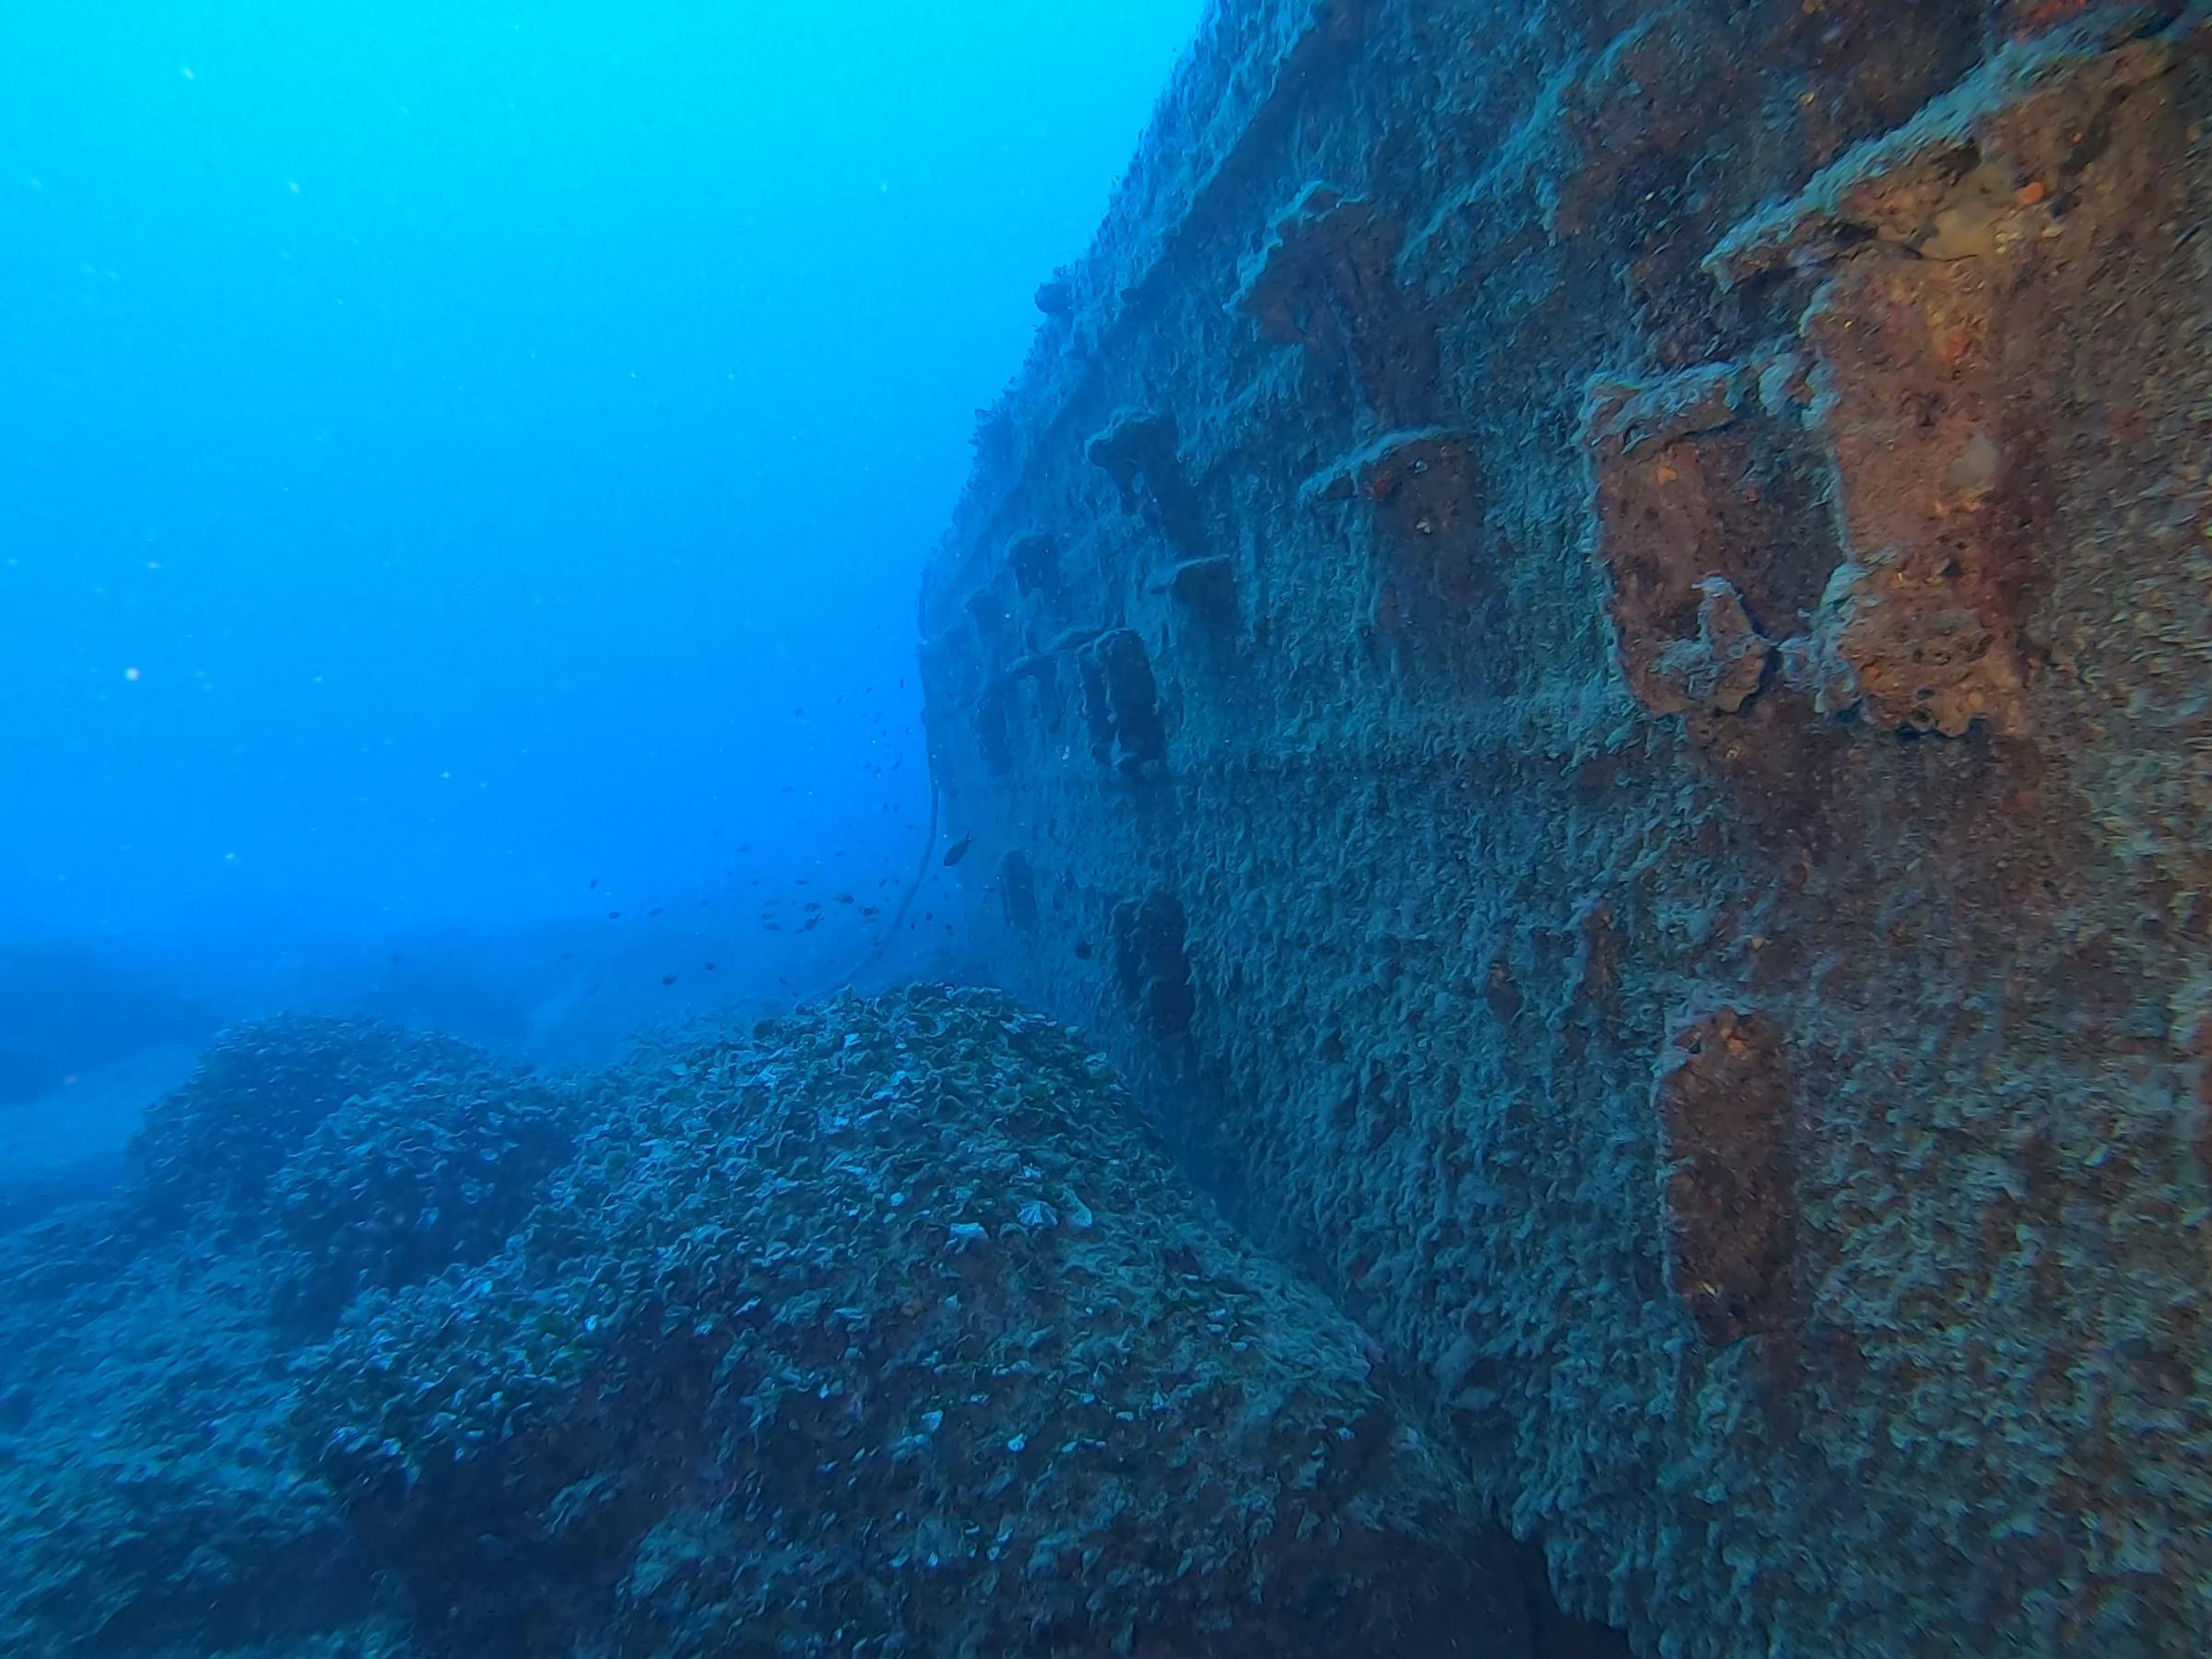 Large Barge [Adam Sant]